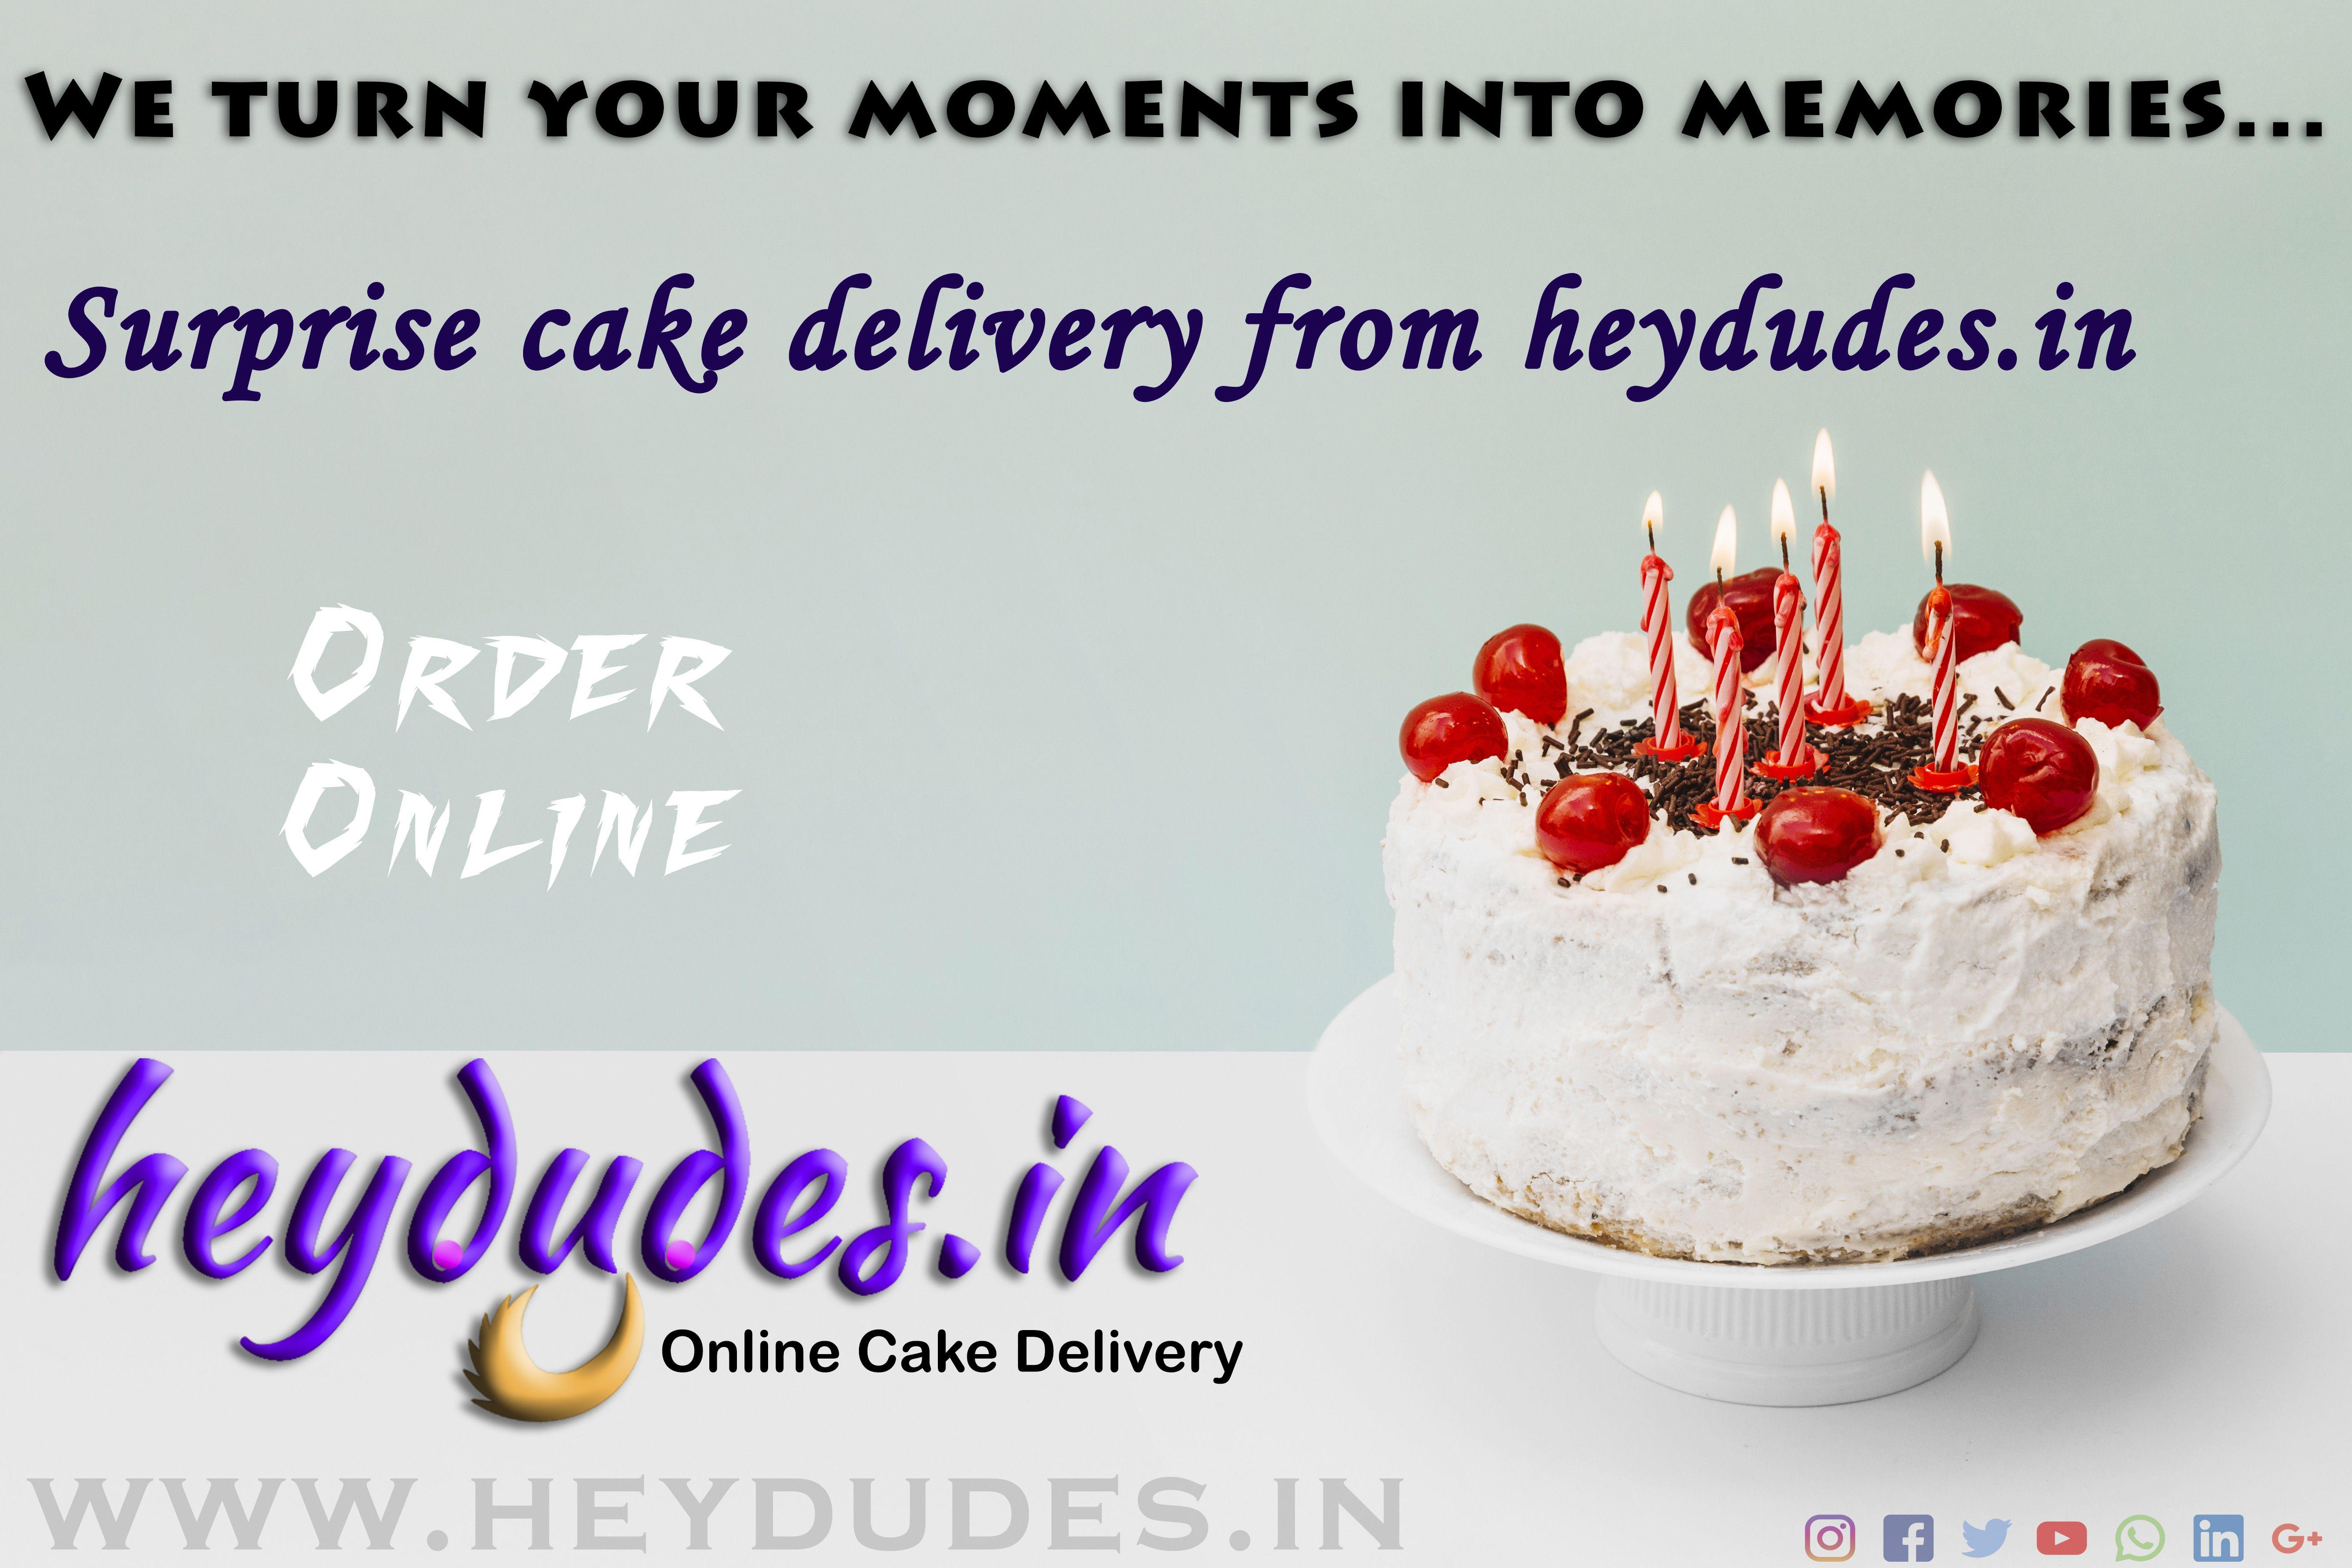 www.heydudes.in